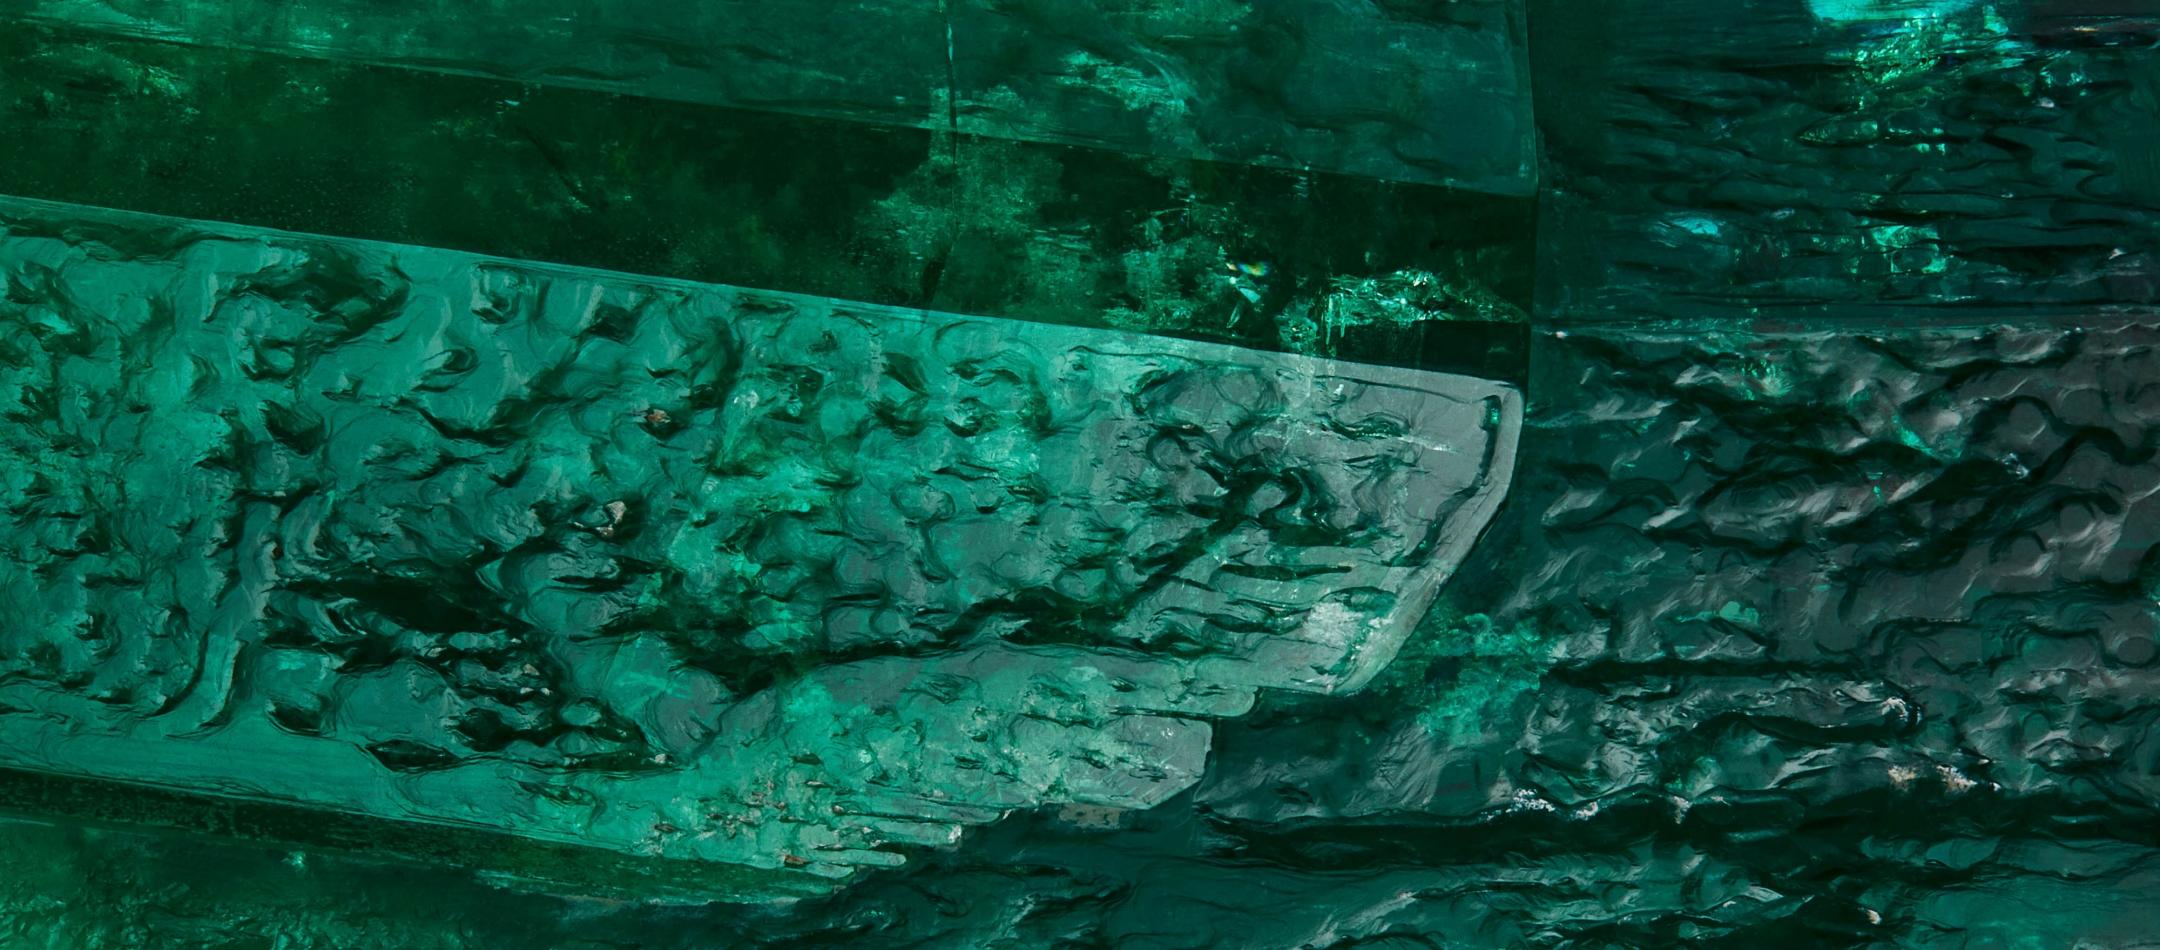 Emerald Detail Highlighting Surface Texture